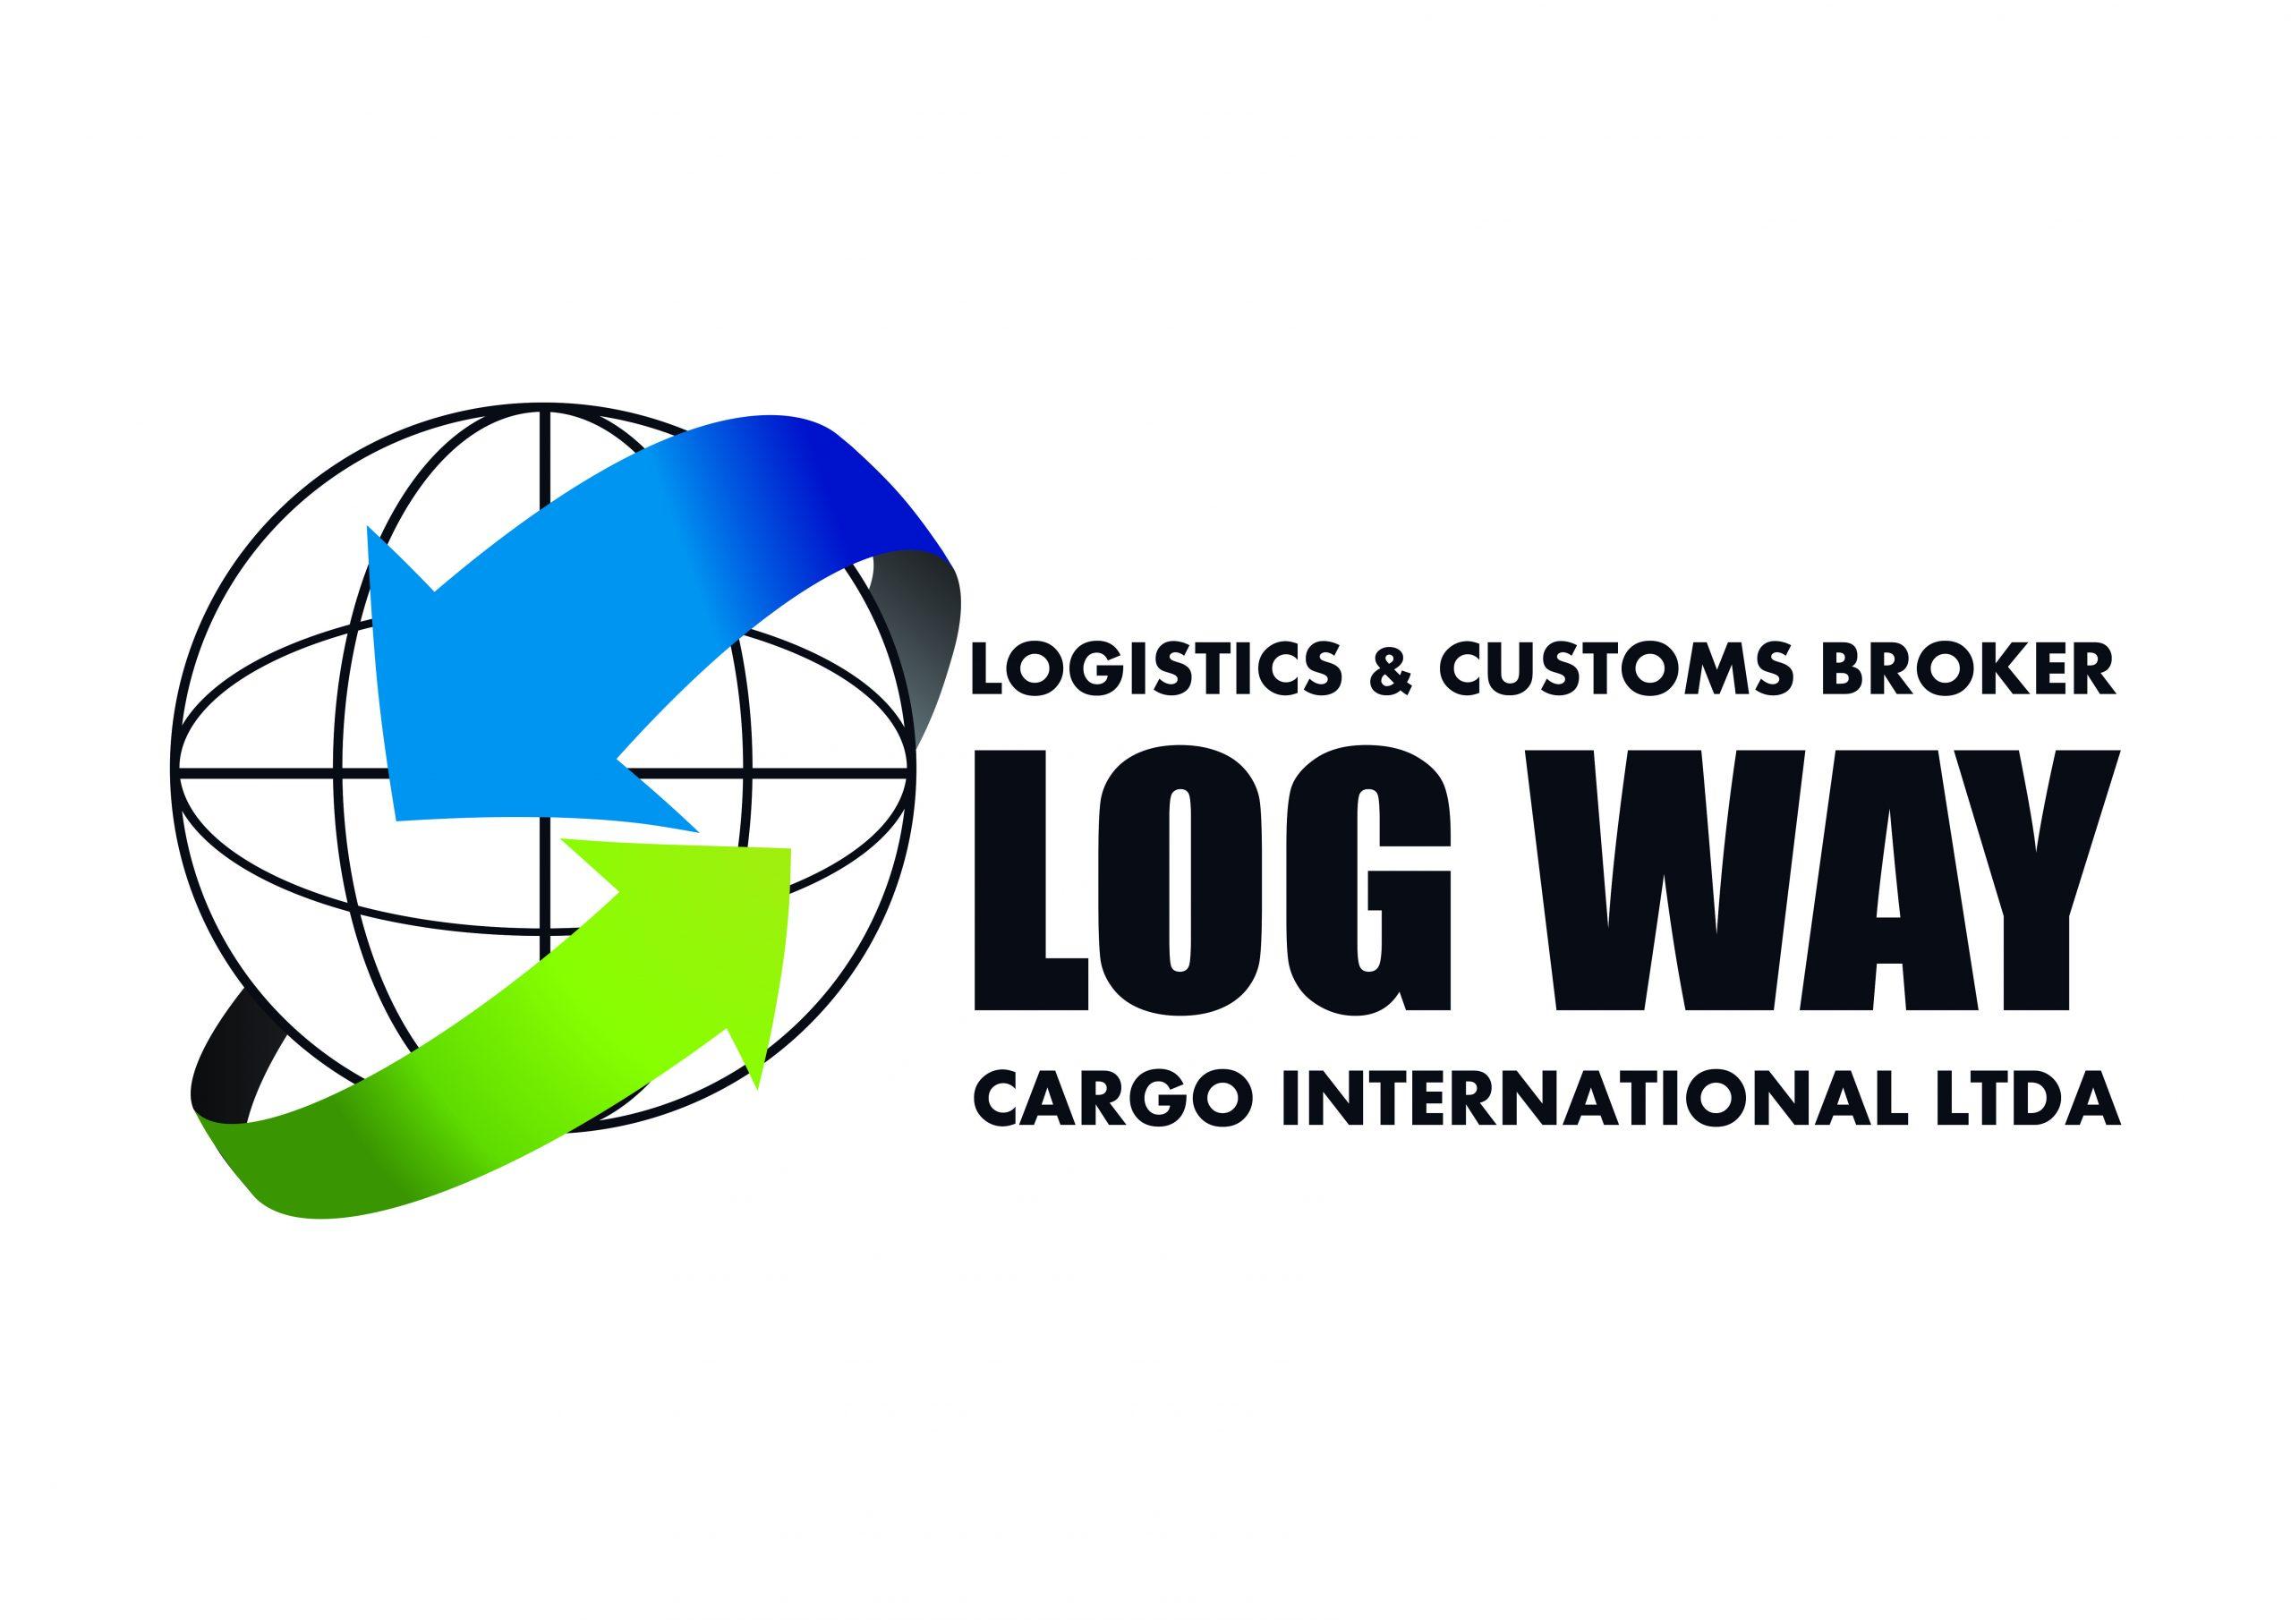 logo_LOGWAY